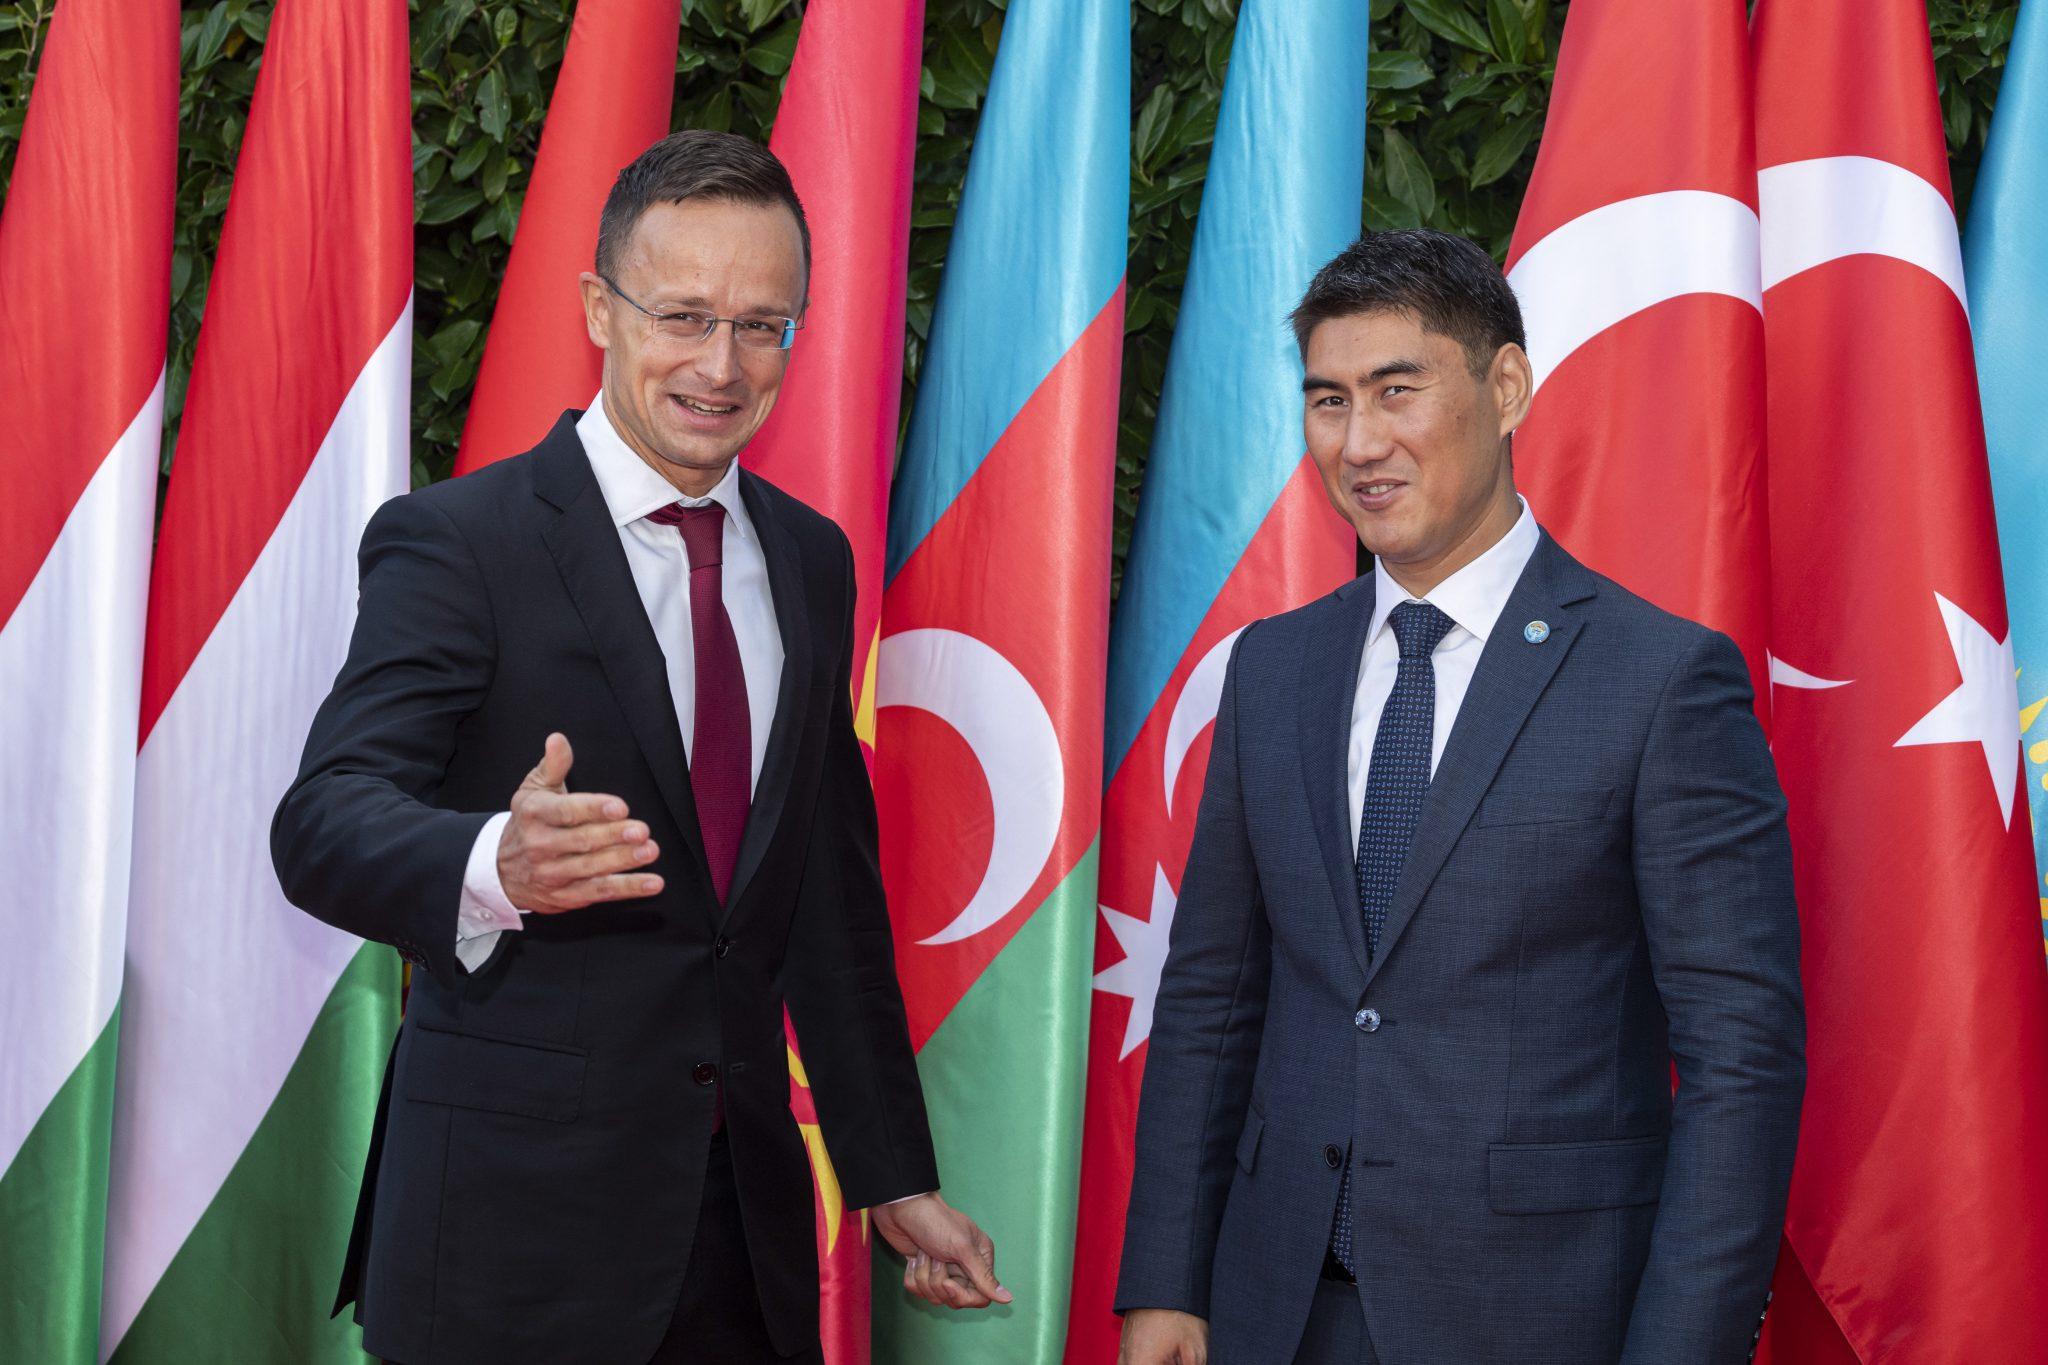 Szijjártó: Cooperation Between Hungary and Kyrgyzstan 'Increasingly Close' post's picture